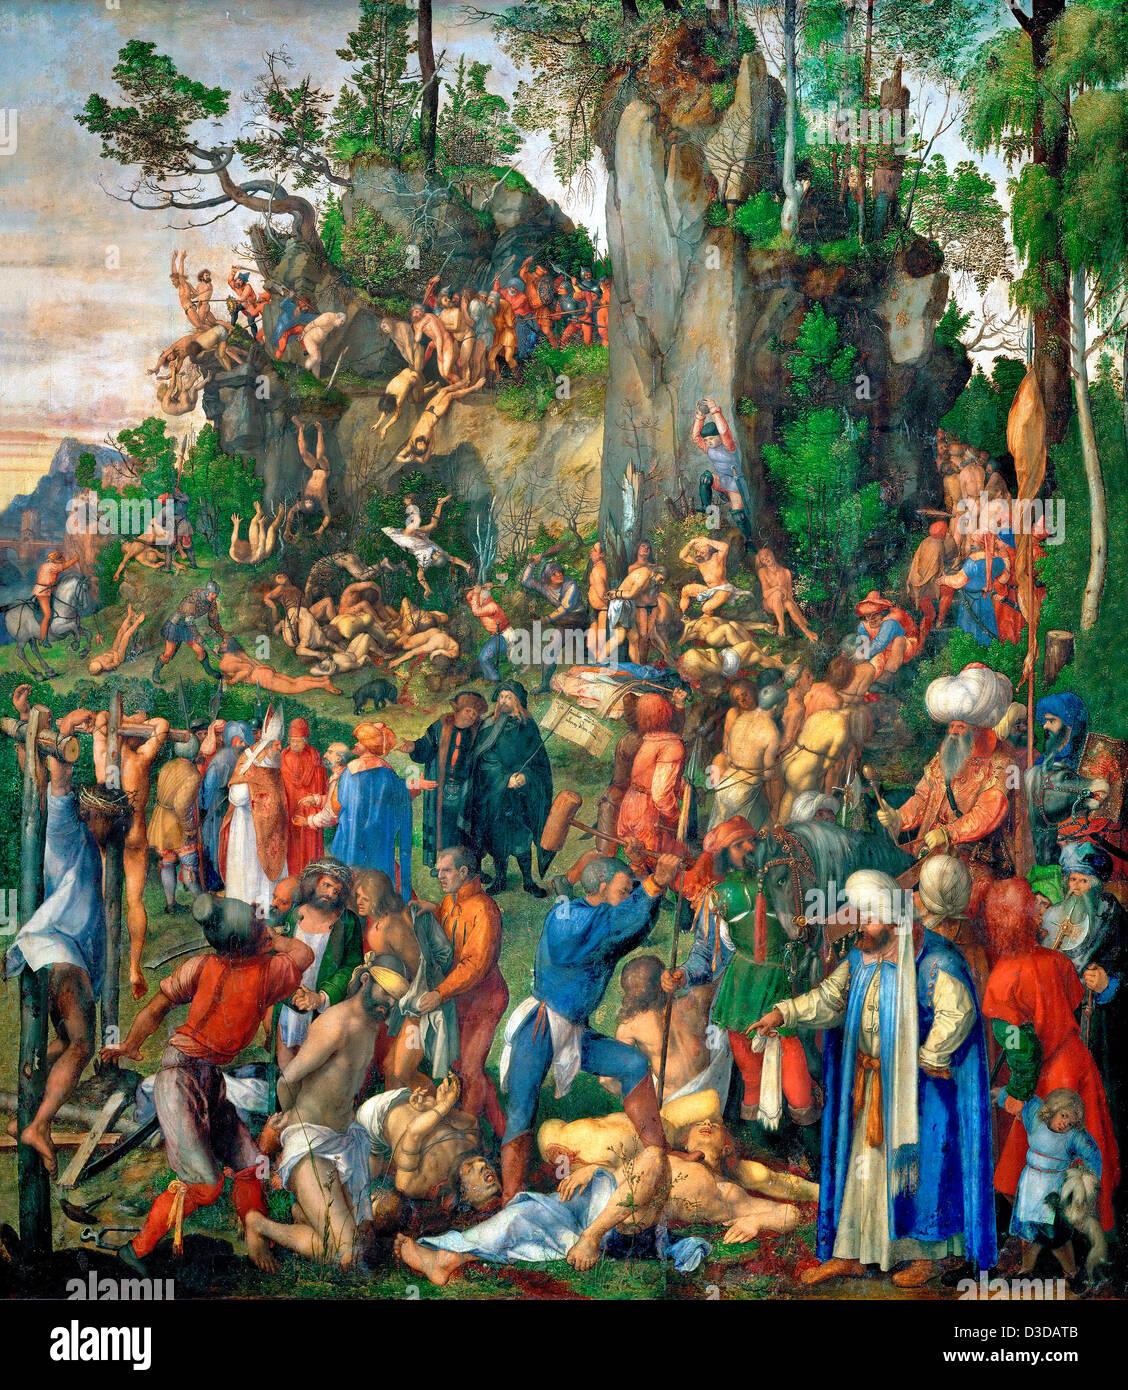 Albrecht Durer, The Martyrdom of the Ten Thousand 1507 Oil on panel. Kunsthistorisches Museum, Vienna - Stock Image